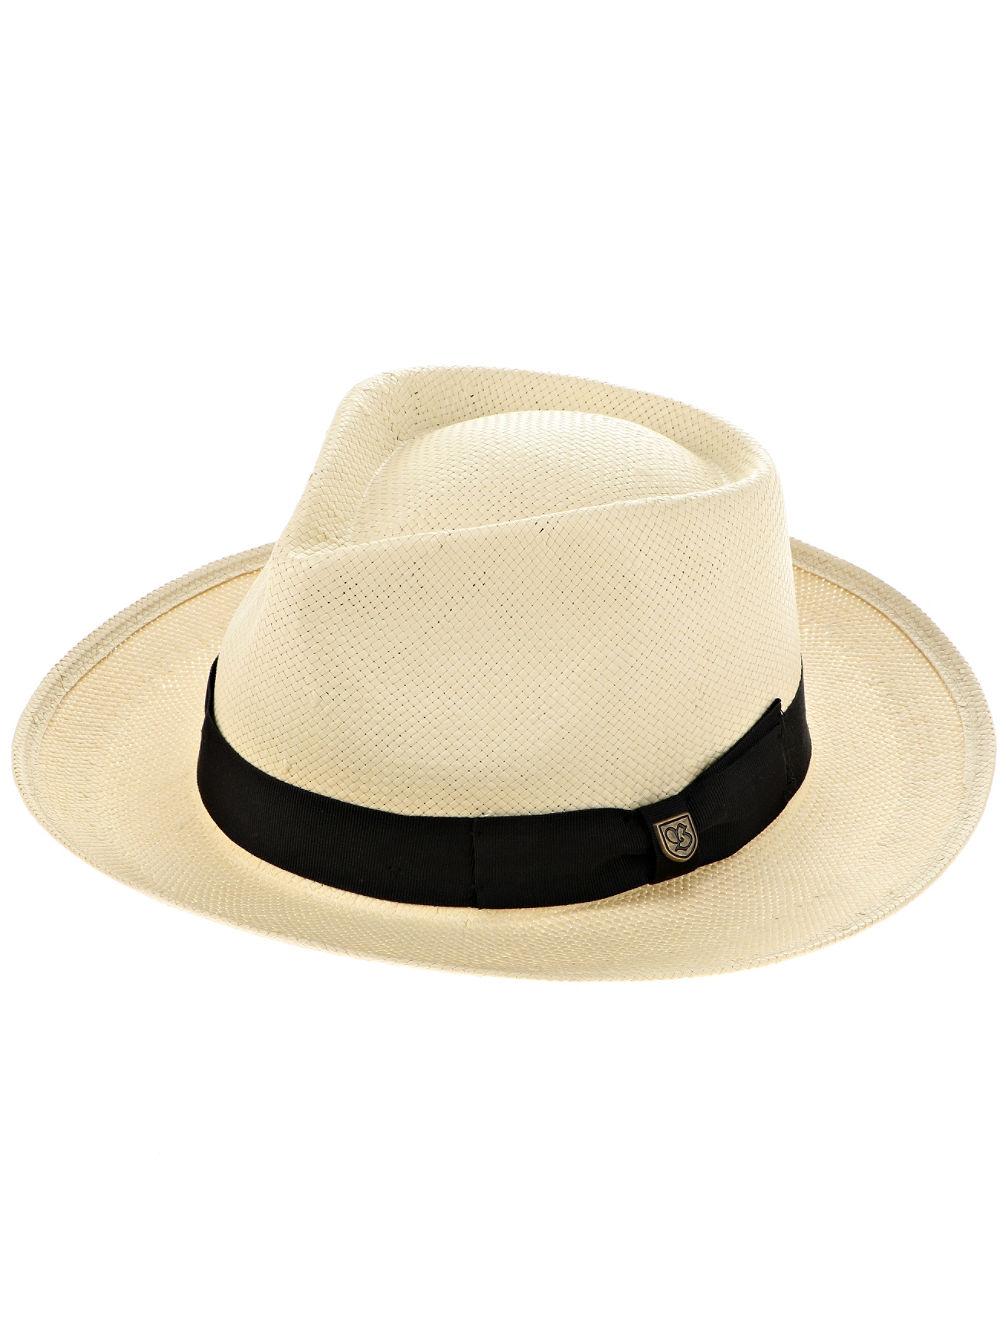 brixton-presley-fedora-hat